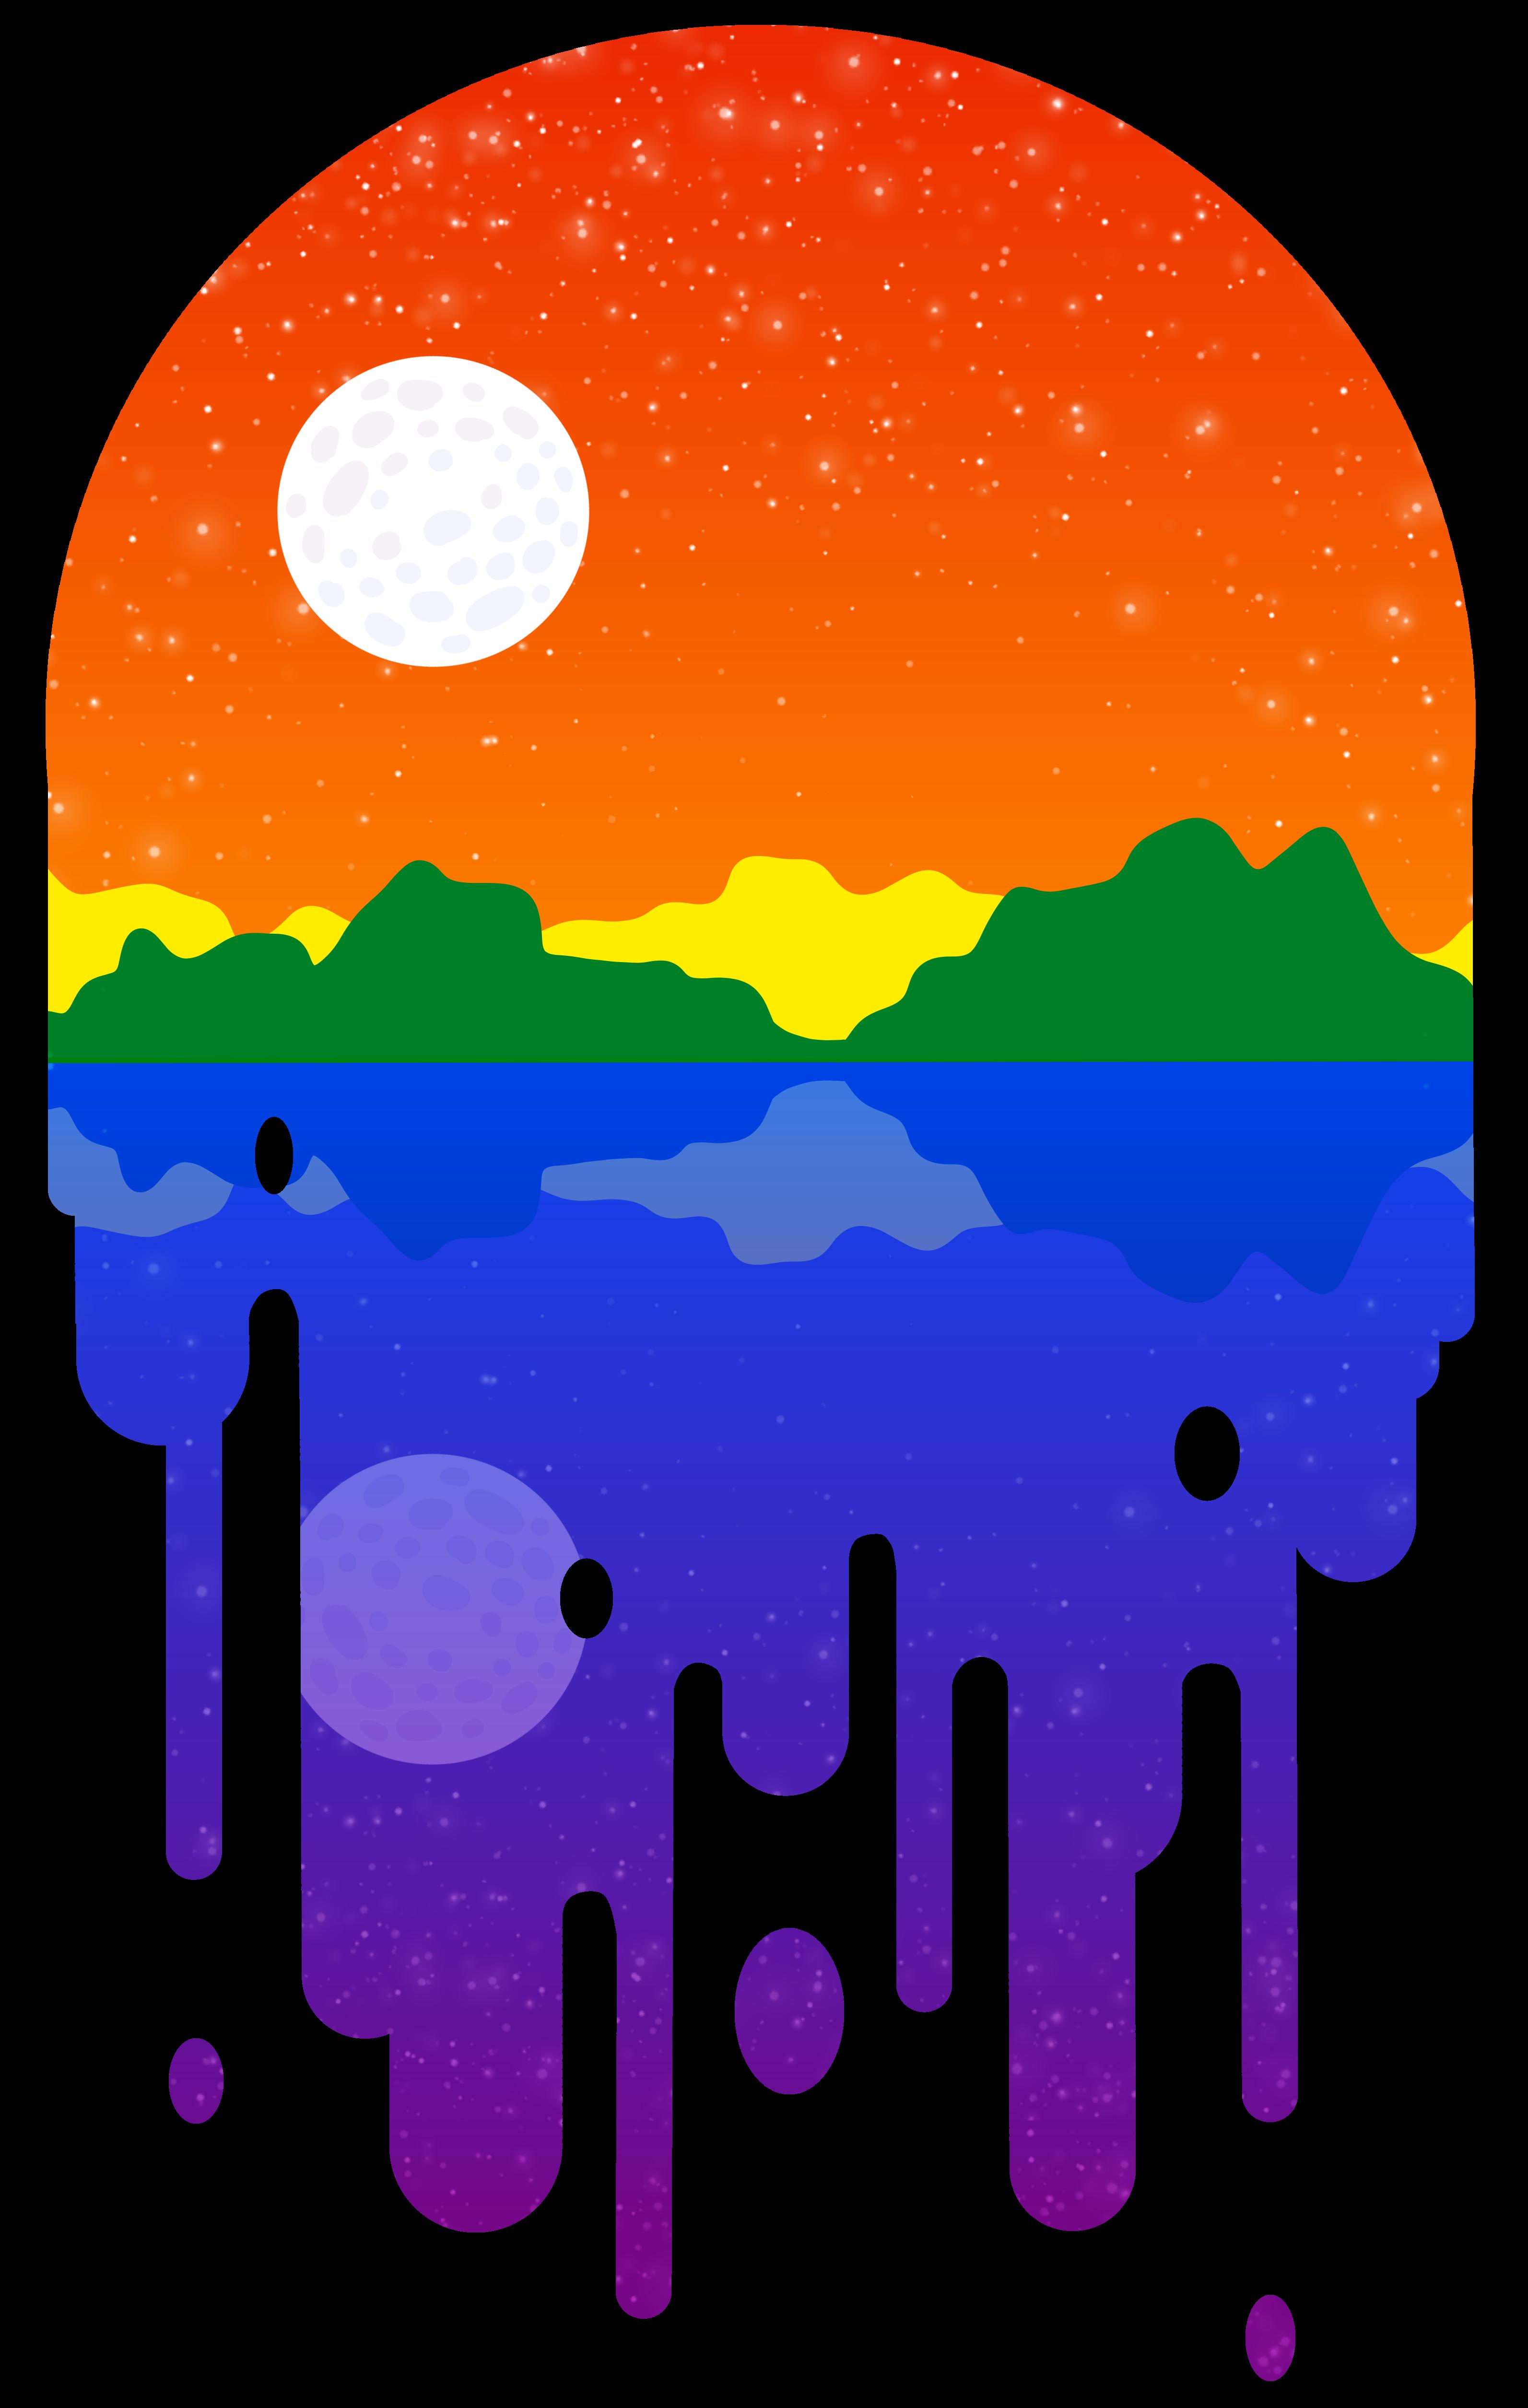 Drip Gay